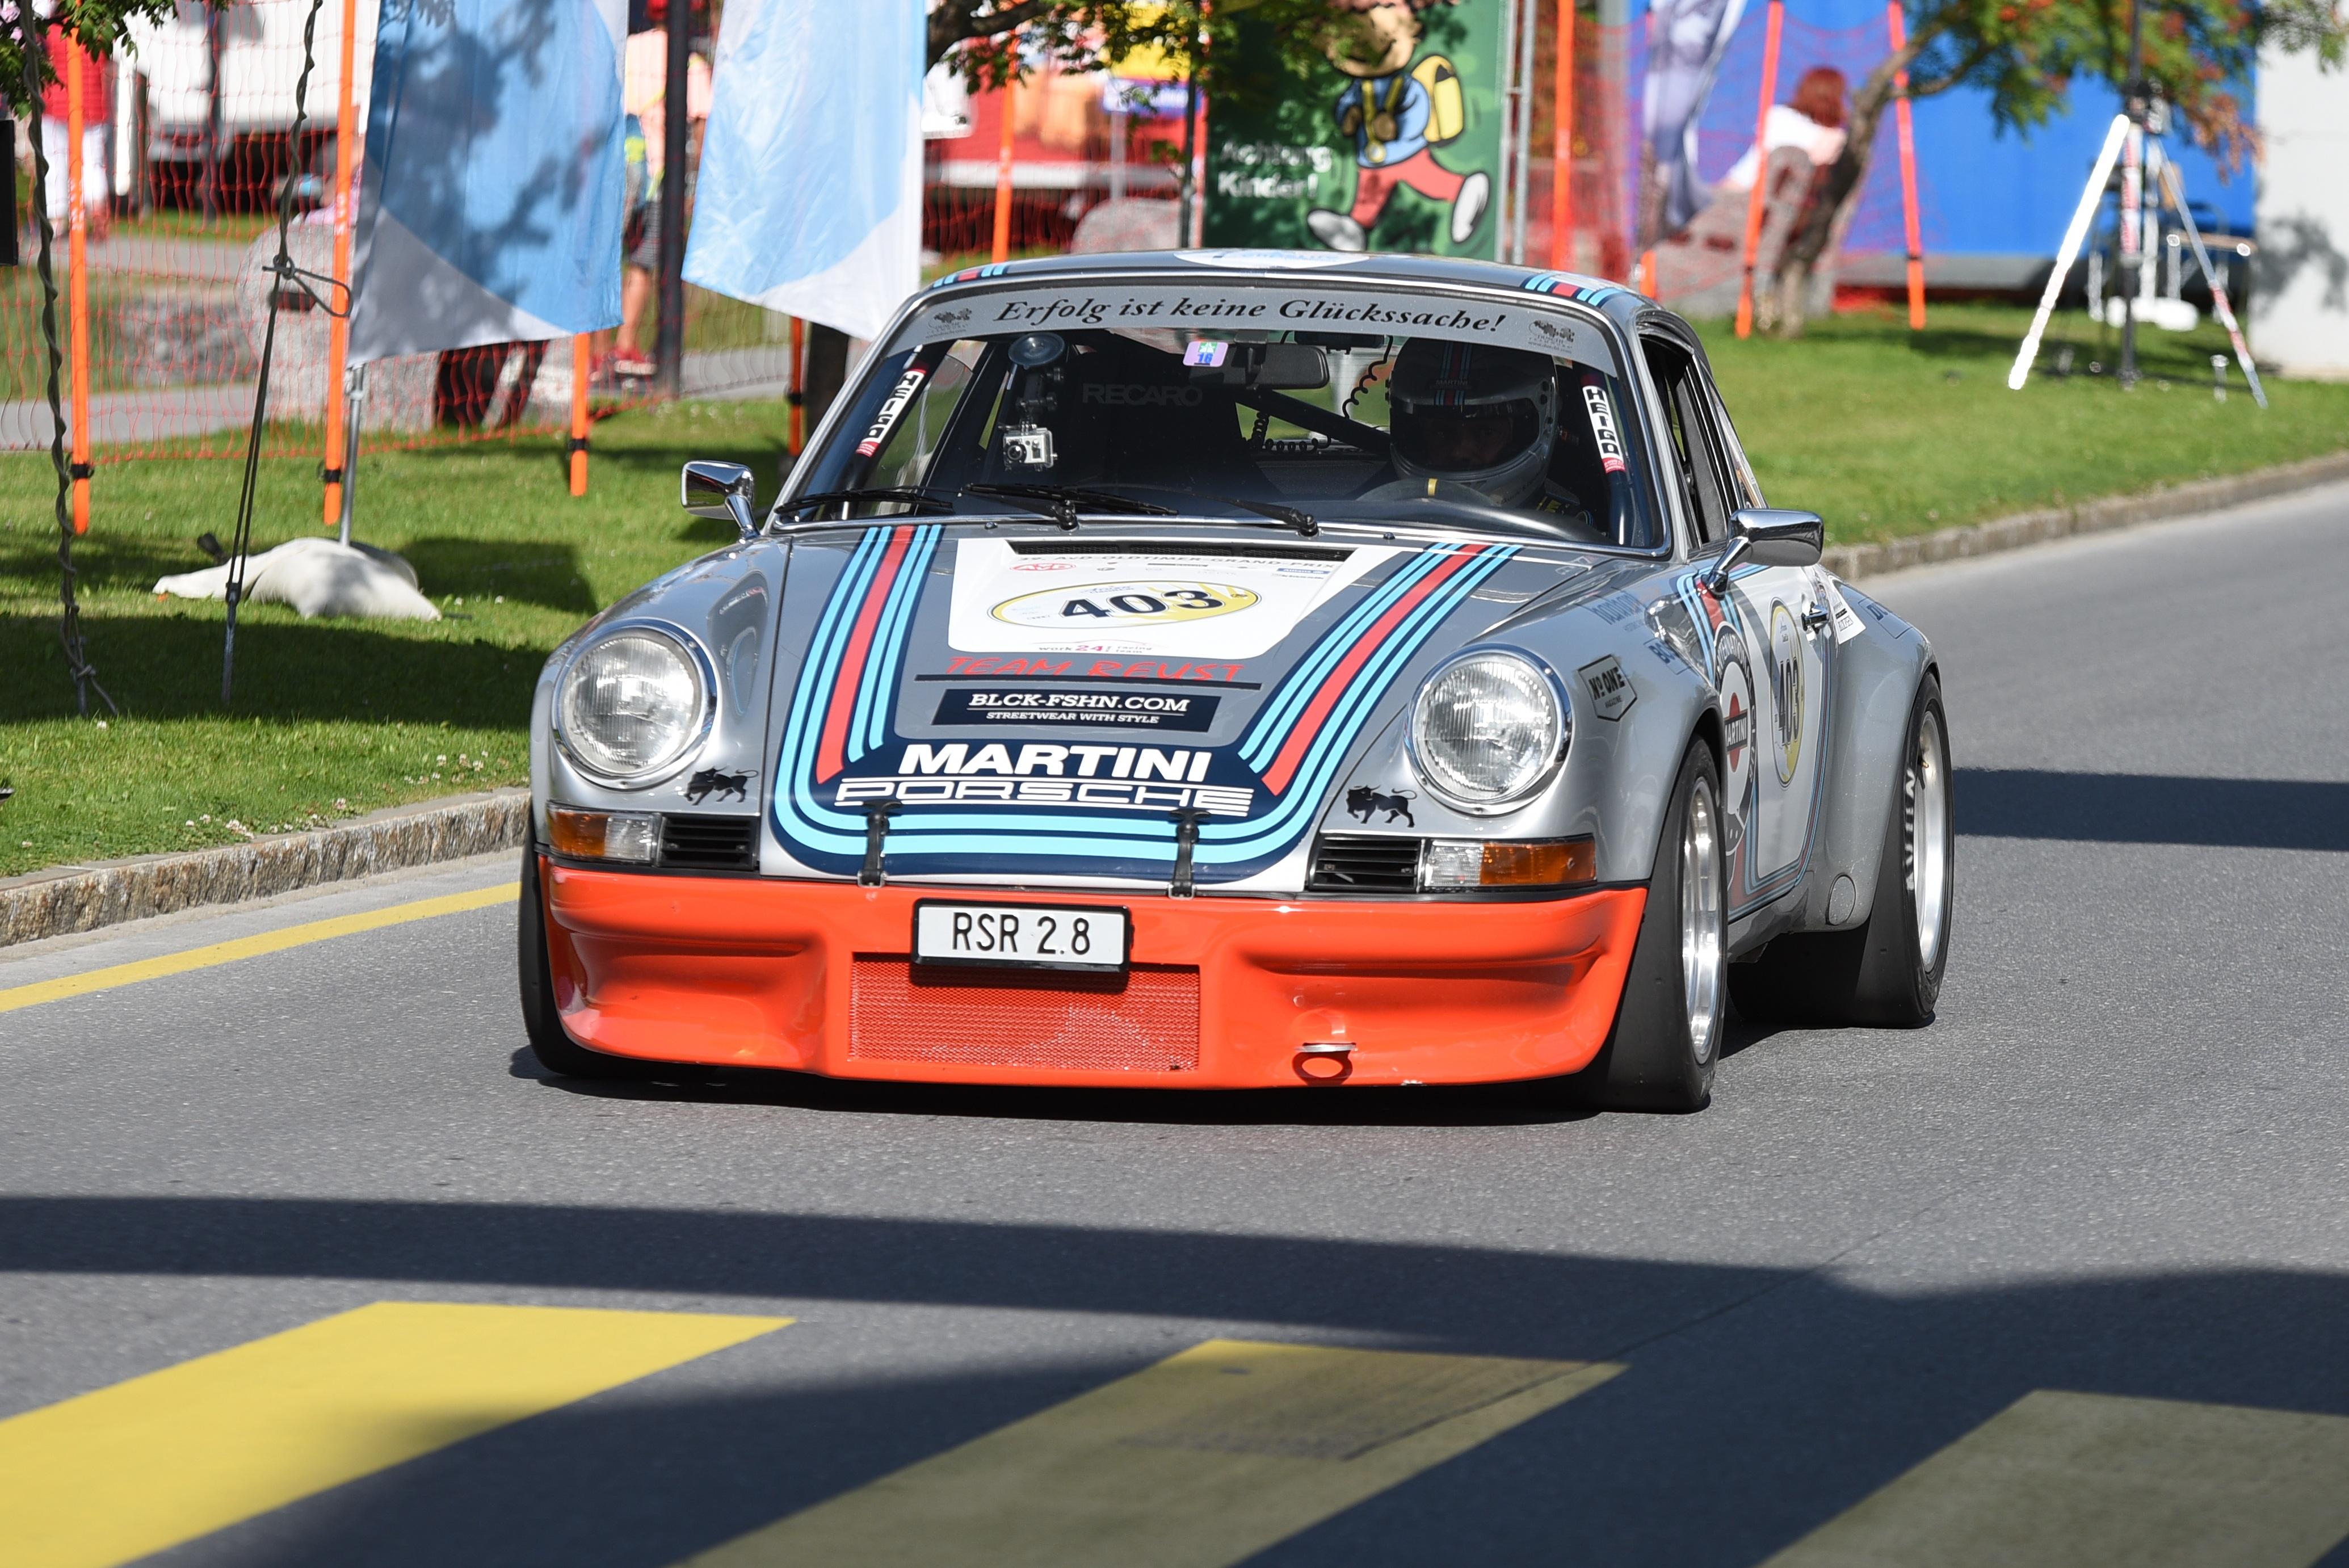 Free Images : Wheel, Sports Car, Supercar, Race Track, Convertible,  Classics, Antique Car, City Car, Arosa, Land Vehicle, Volkswagen Beetle,  Porsche 911, ...